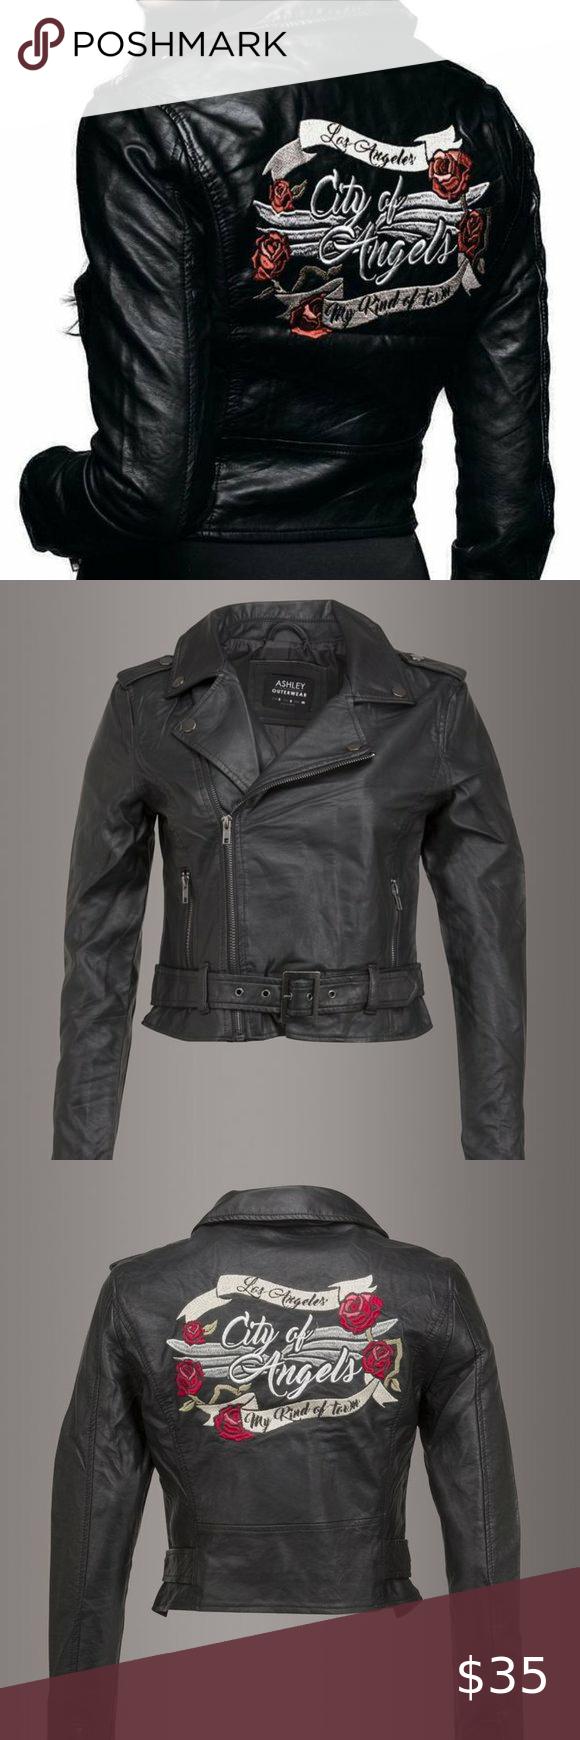 Ashley Outerwear Los Angeles Faux Leather Jacket Ashley Outerwear Los Angeles Faux Leather Jacket Size Xl Featu Leather Jacket Faux Leather Jackets Outerwear [ 1740 x 580 Pixel ]